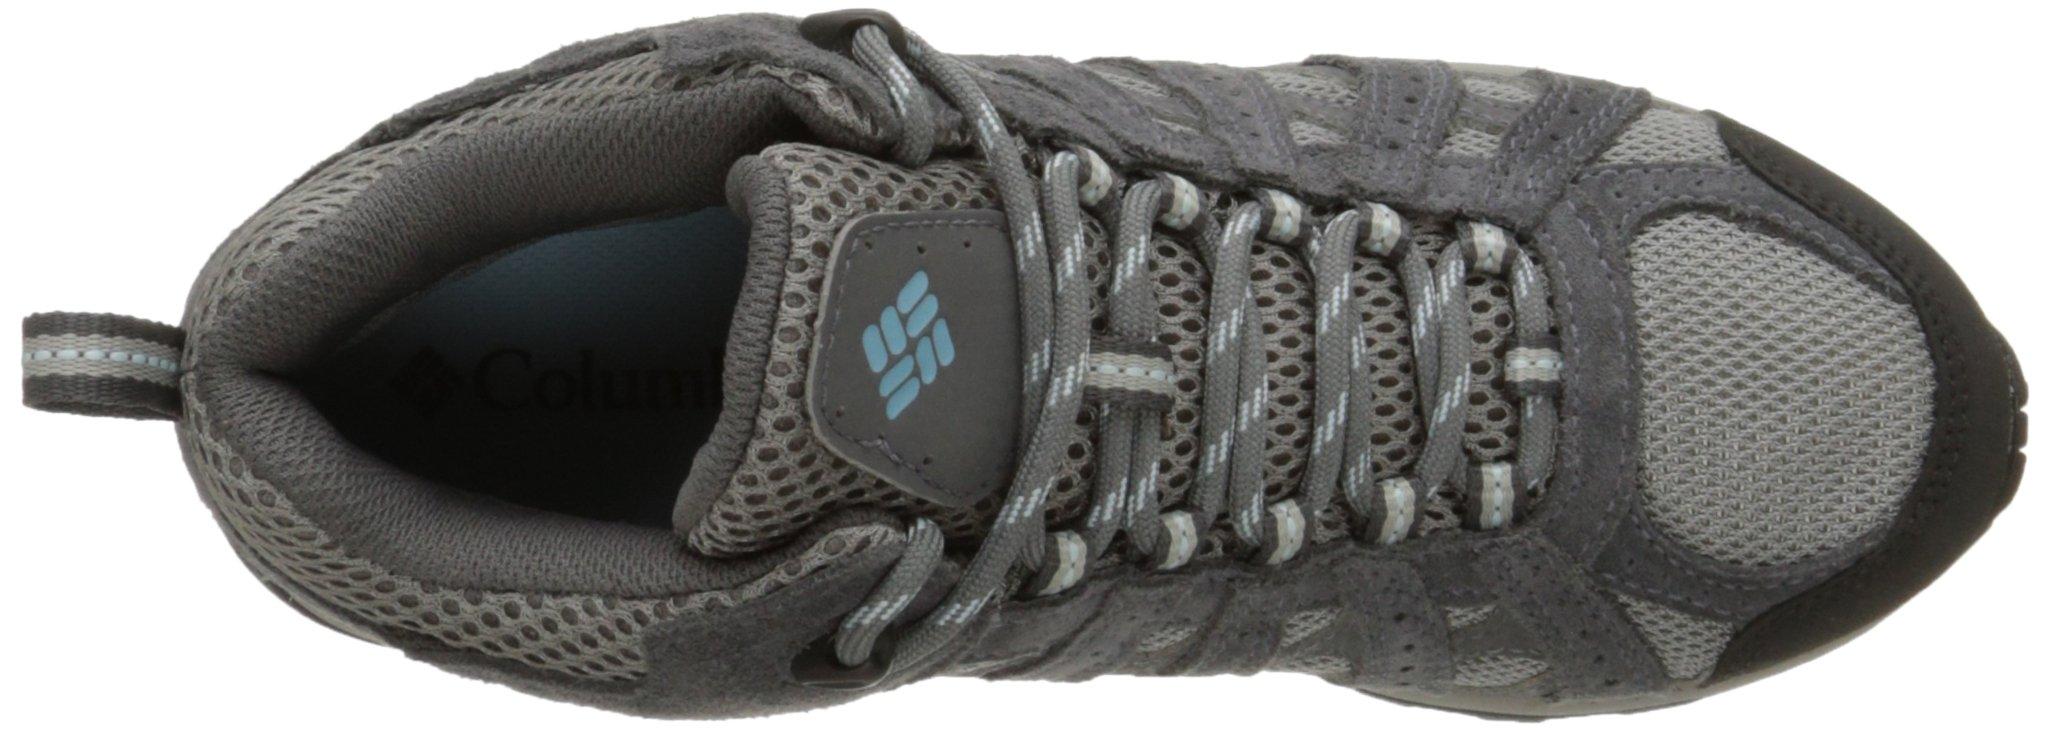 71ipOKbFkOL - Columbia Women's Redmond Mid Waterproof, Multisport Outdoor Shoes